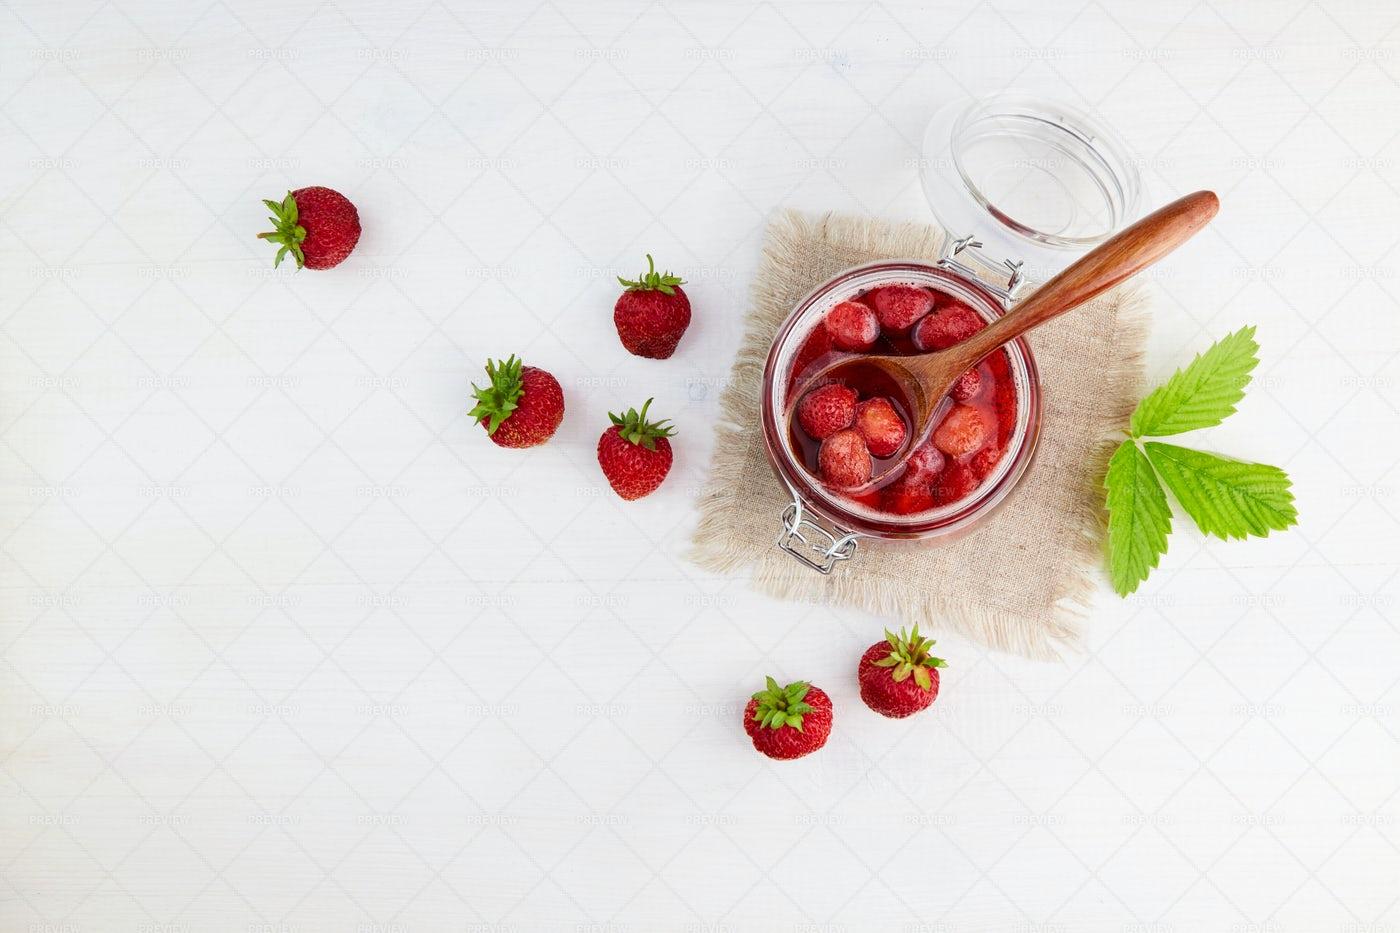 Strawberry Jam In A Glass Jar: Stock Photos